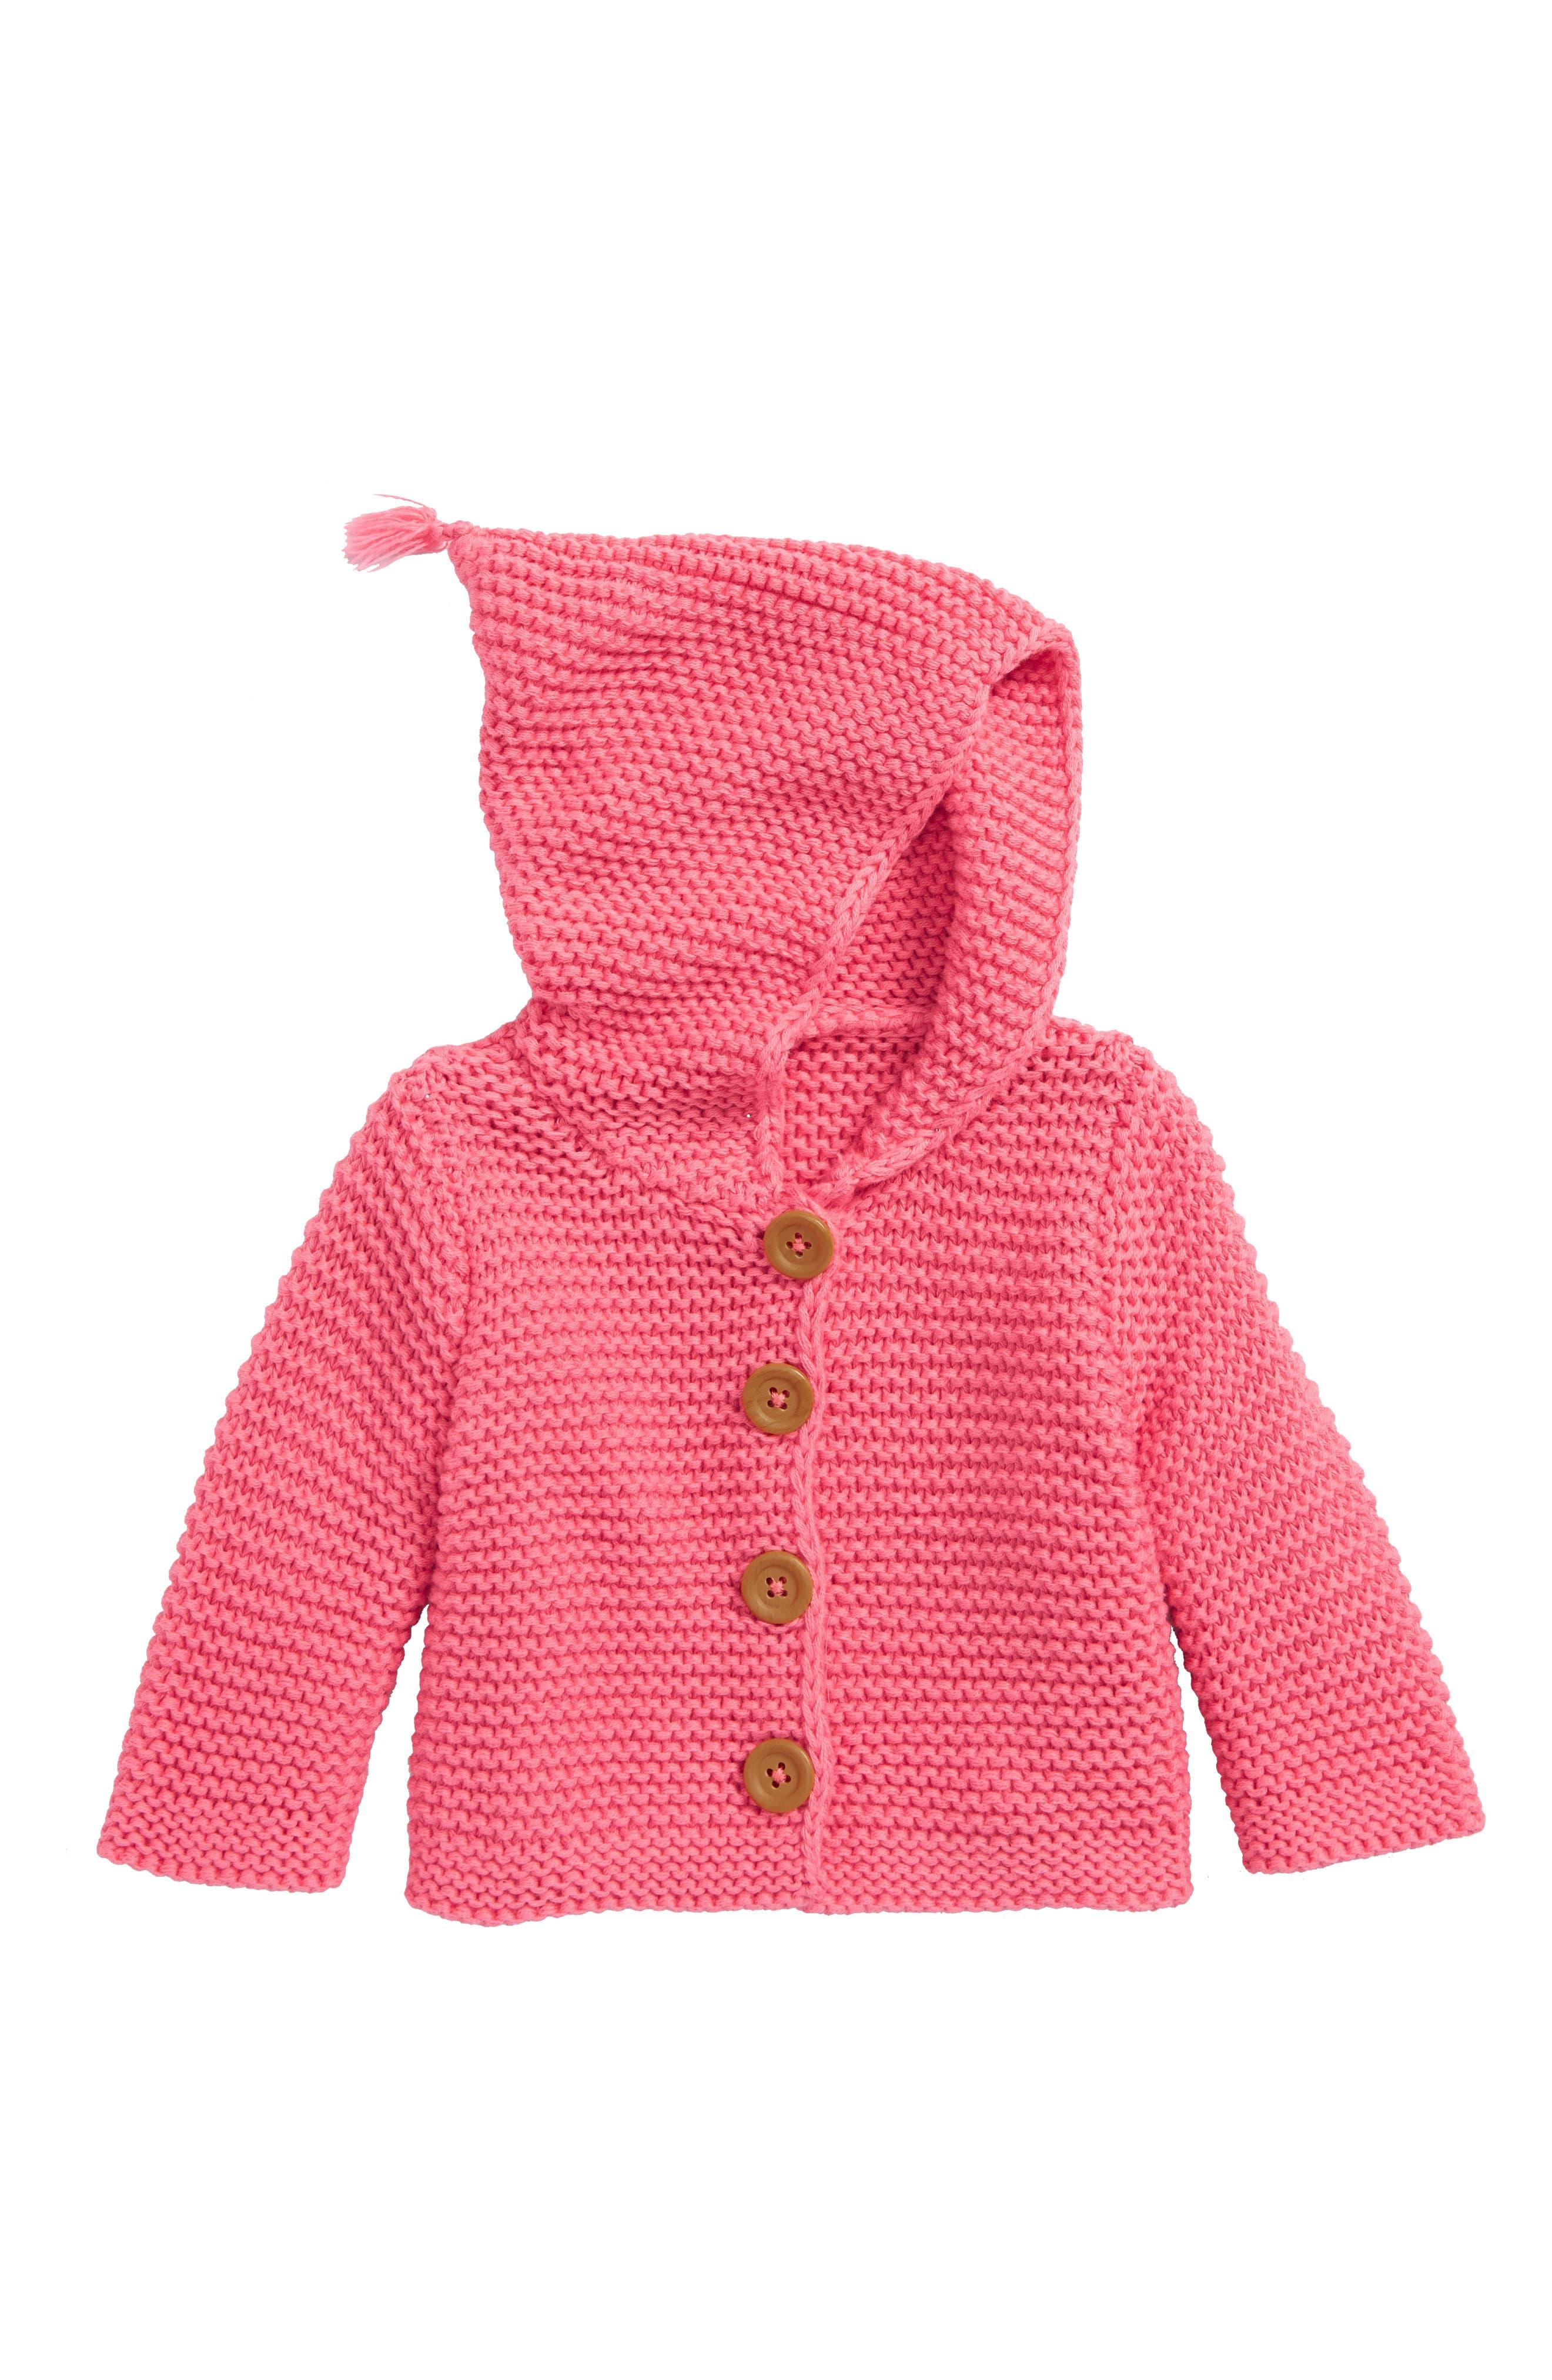 Main Image - Nordstrom Baby Lofty Organic Cotton Hooded Cardigan (Baby Girls)